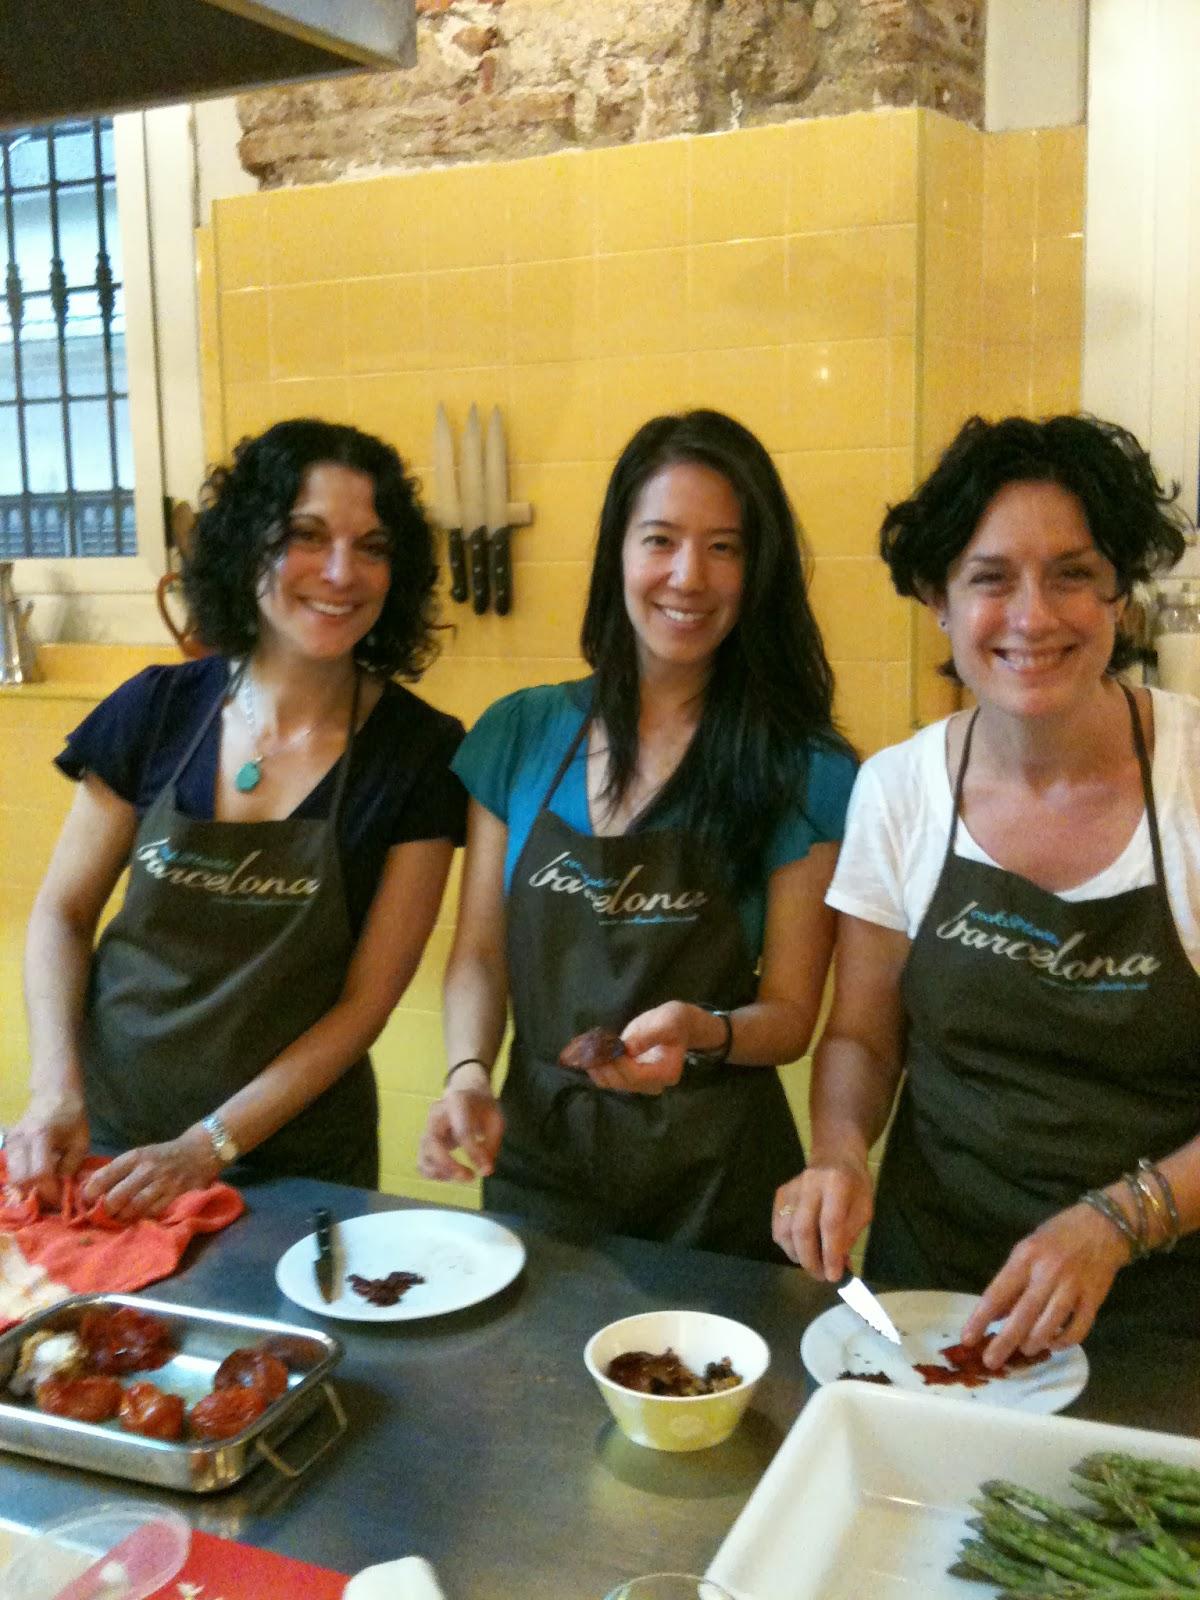 Barcelona - Cook & Taste cooking class